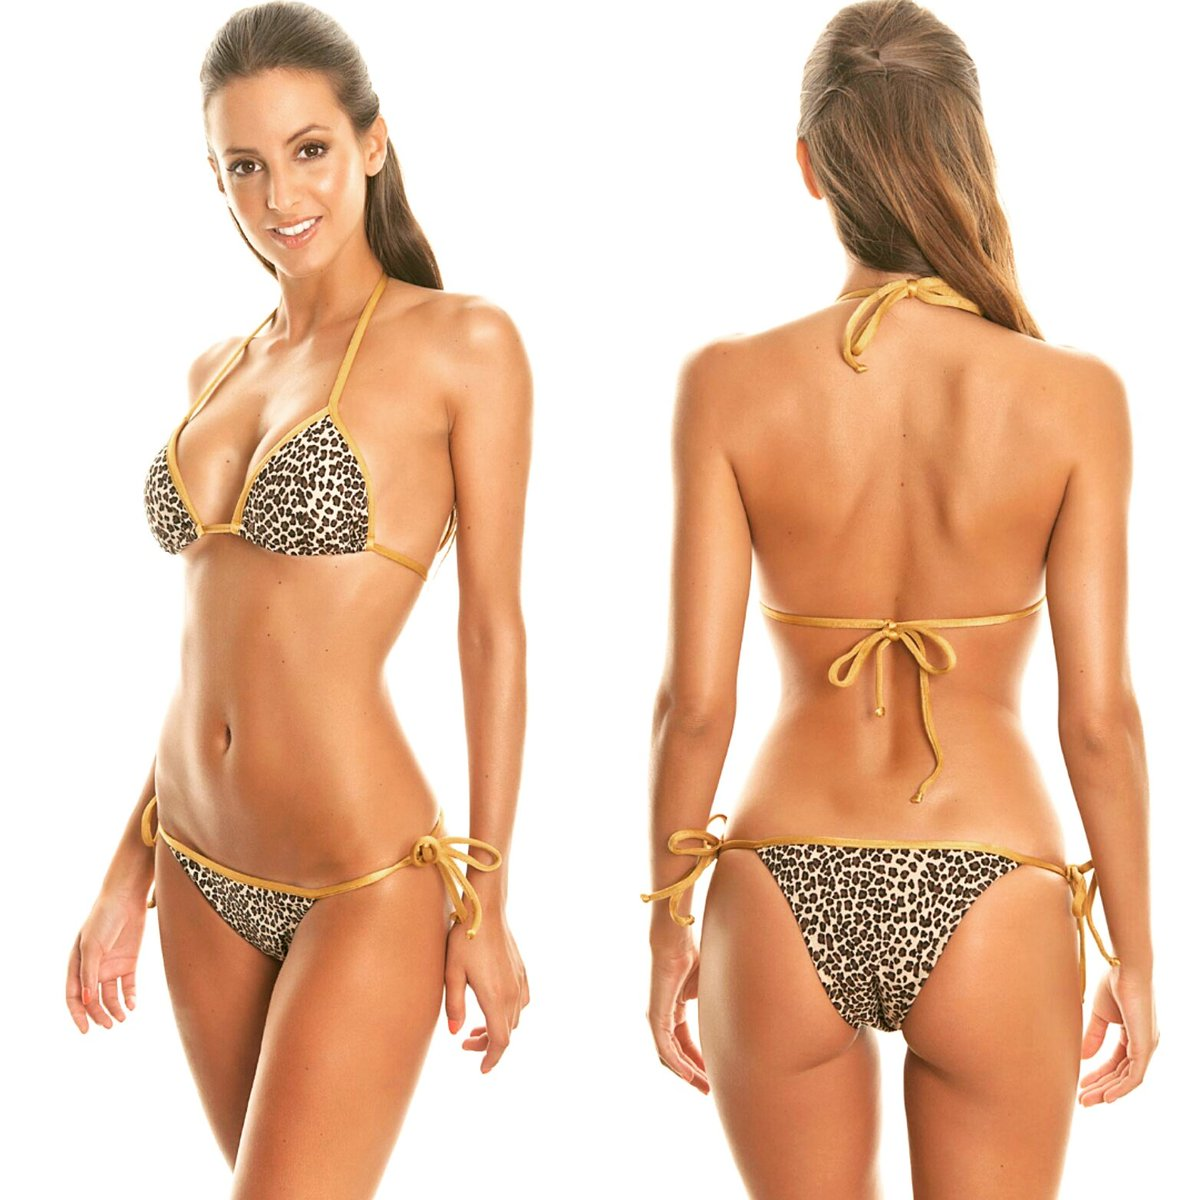 Laser hair removal bikini line styles to choose